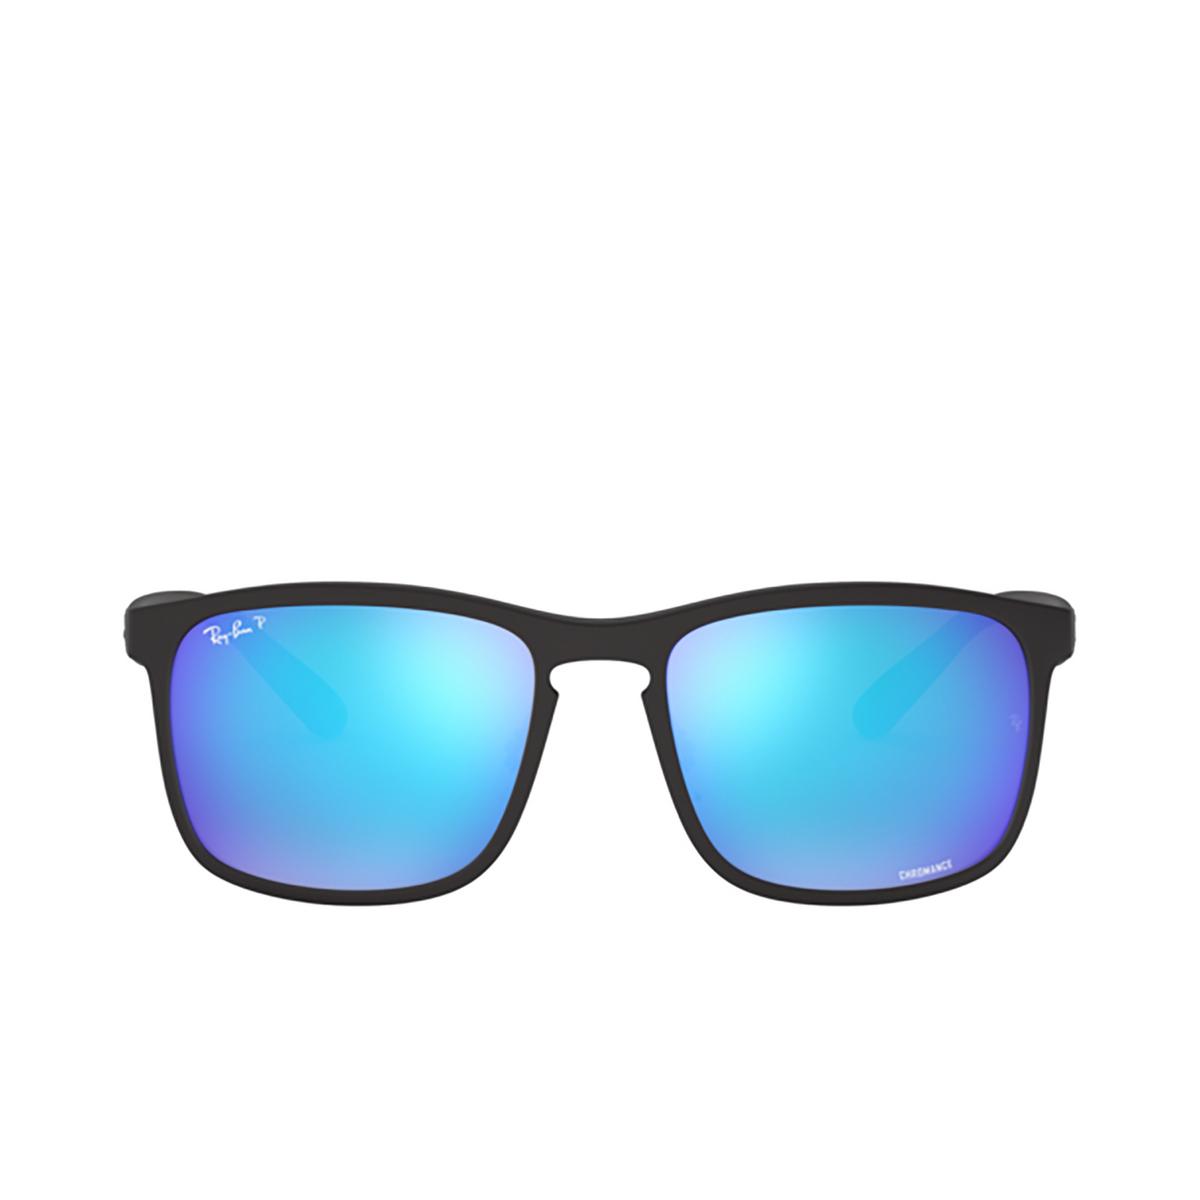 Ray-Ban® Square Sunglasses: RB4264 color Matte Black 601SA1 - 1/3.